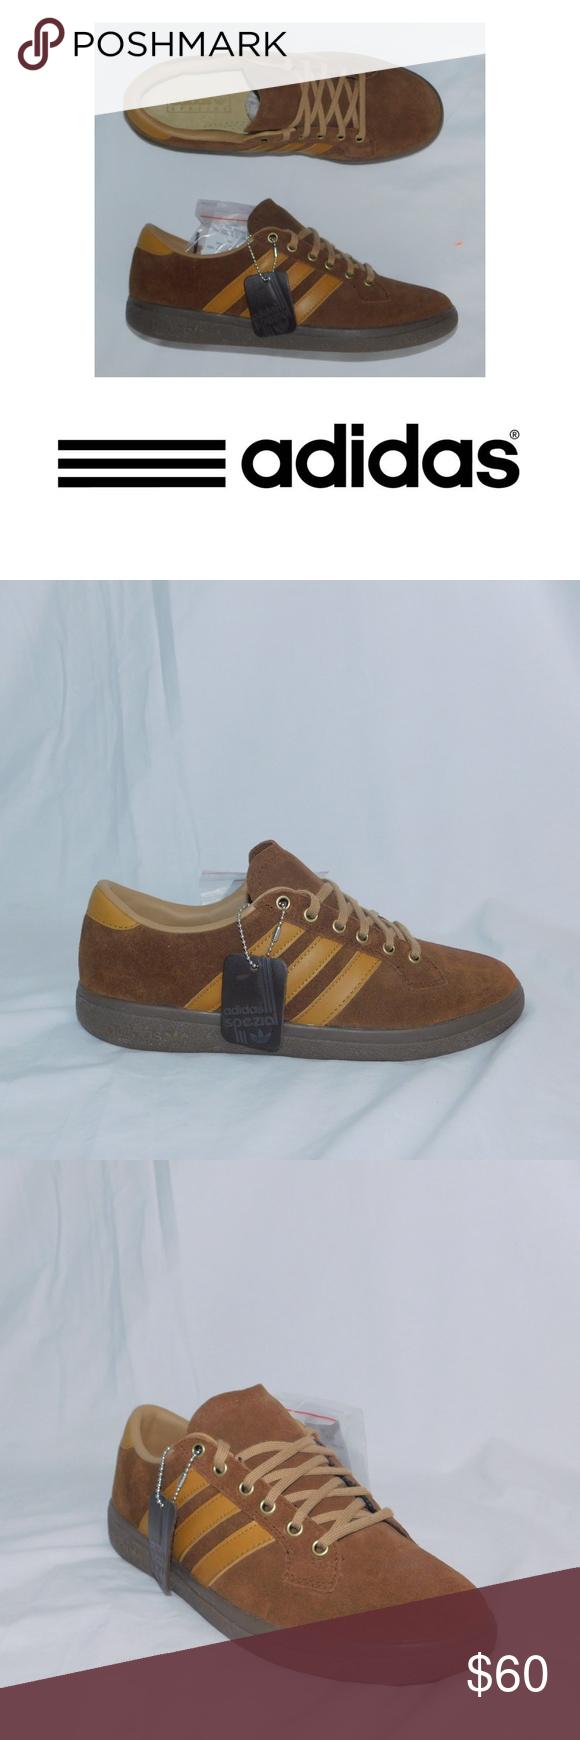 Adidas Originals Bulhill Spezial Leather Sneaker Brand New Adidas ...